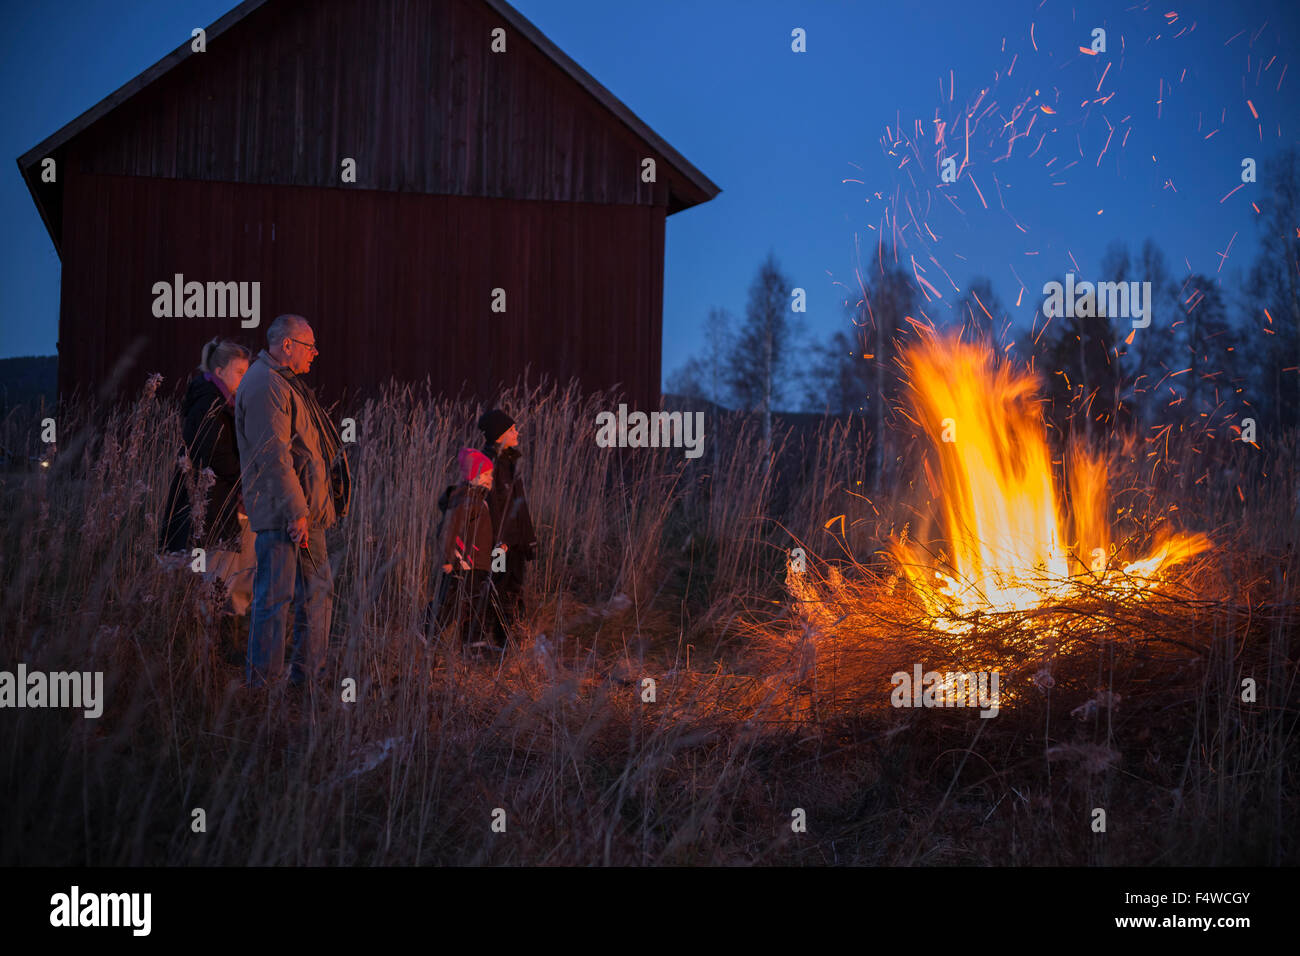 Suecia, Narke, Filipshyttan, abuelo con los nietos (6-7,8-9,16-17) mirando fogata Imagen De Stock